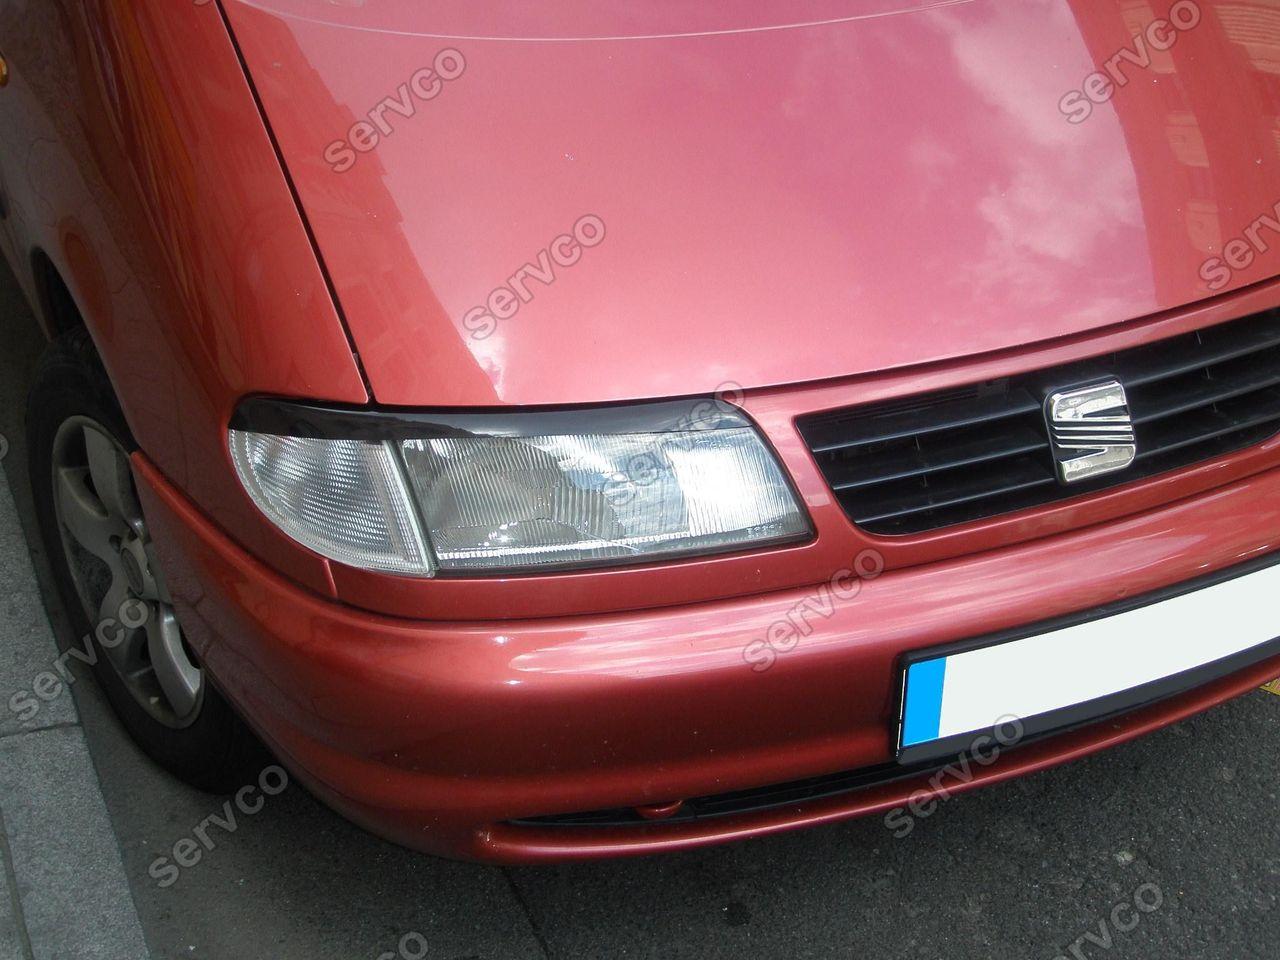 Pleoape faruri Vw Sharan fara facelift 1995-2000 ver1